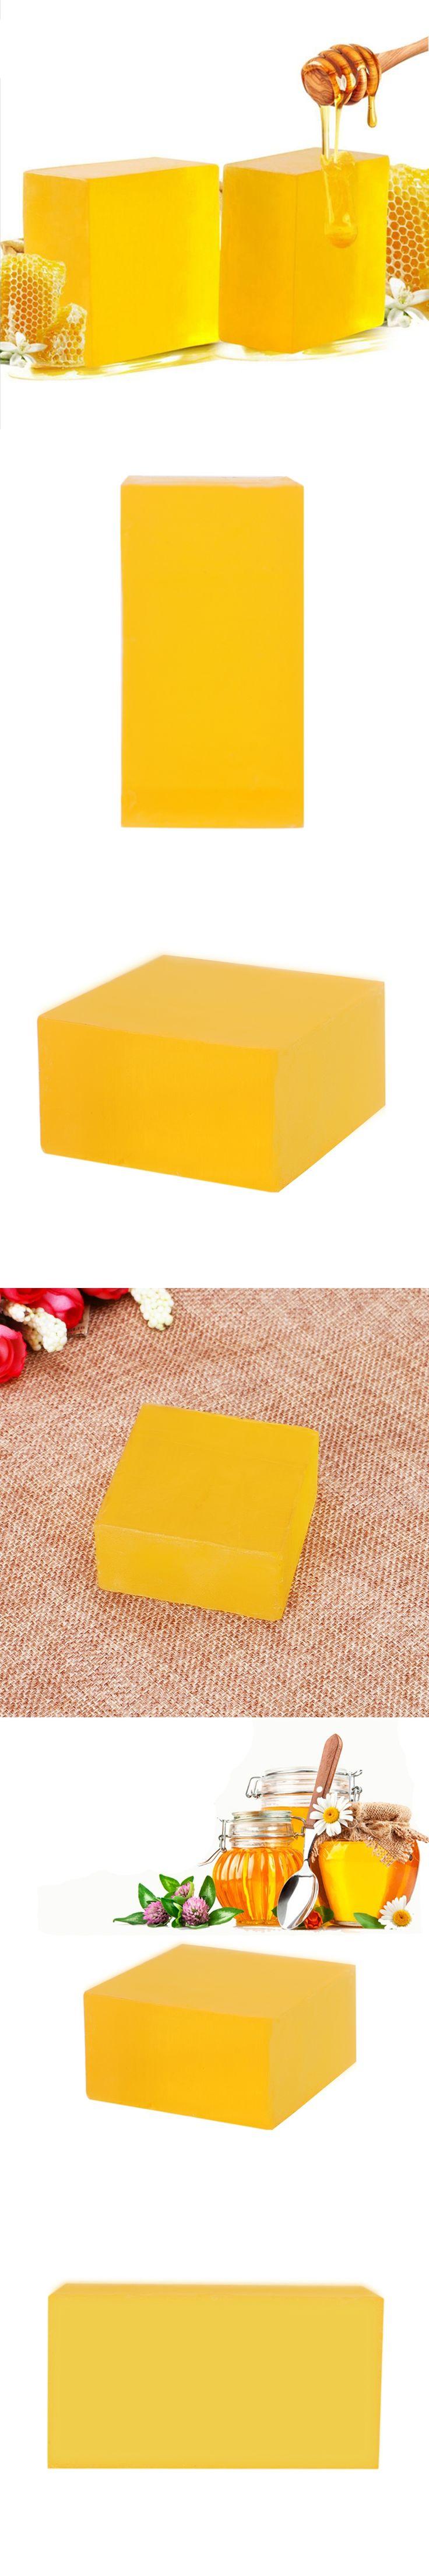 35 Best Bath Shower Images On Pinterest Sabun Kojic Perpect Whitening Soap 100 Handmade Peeling Glutathione Arbutin Honey Acid 100g